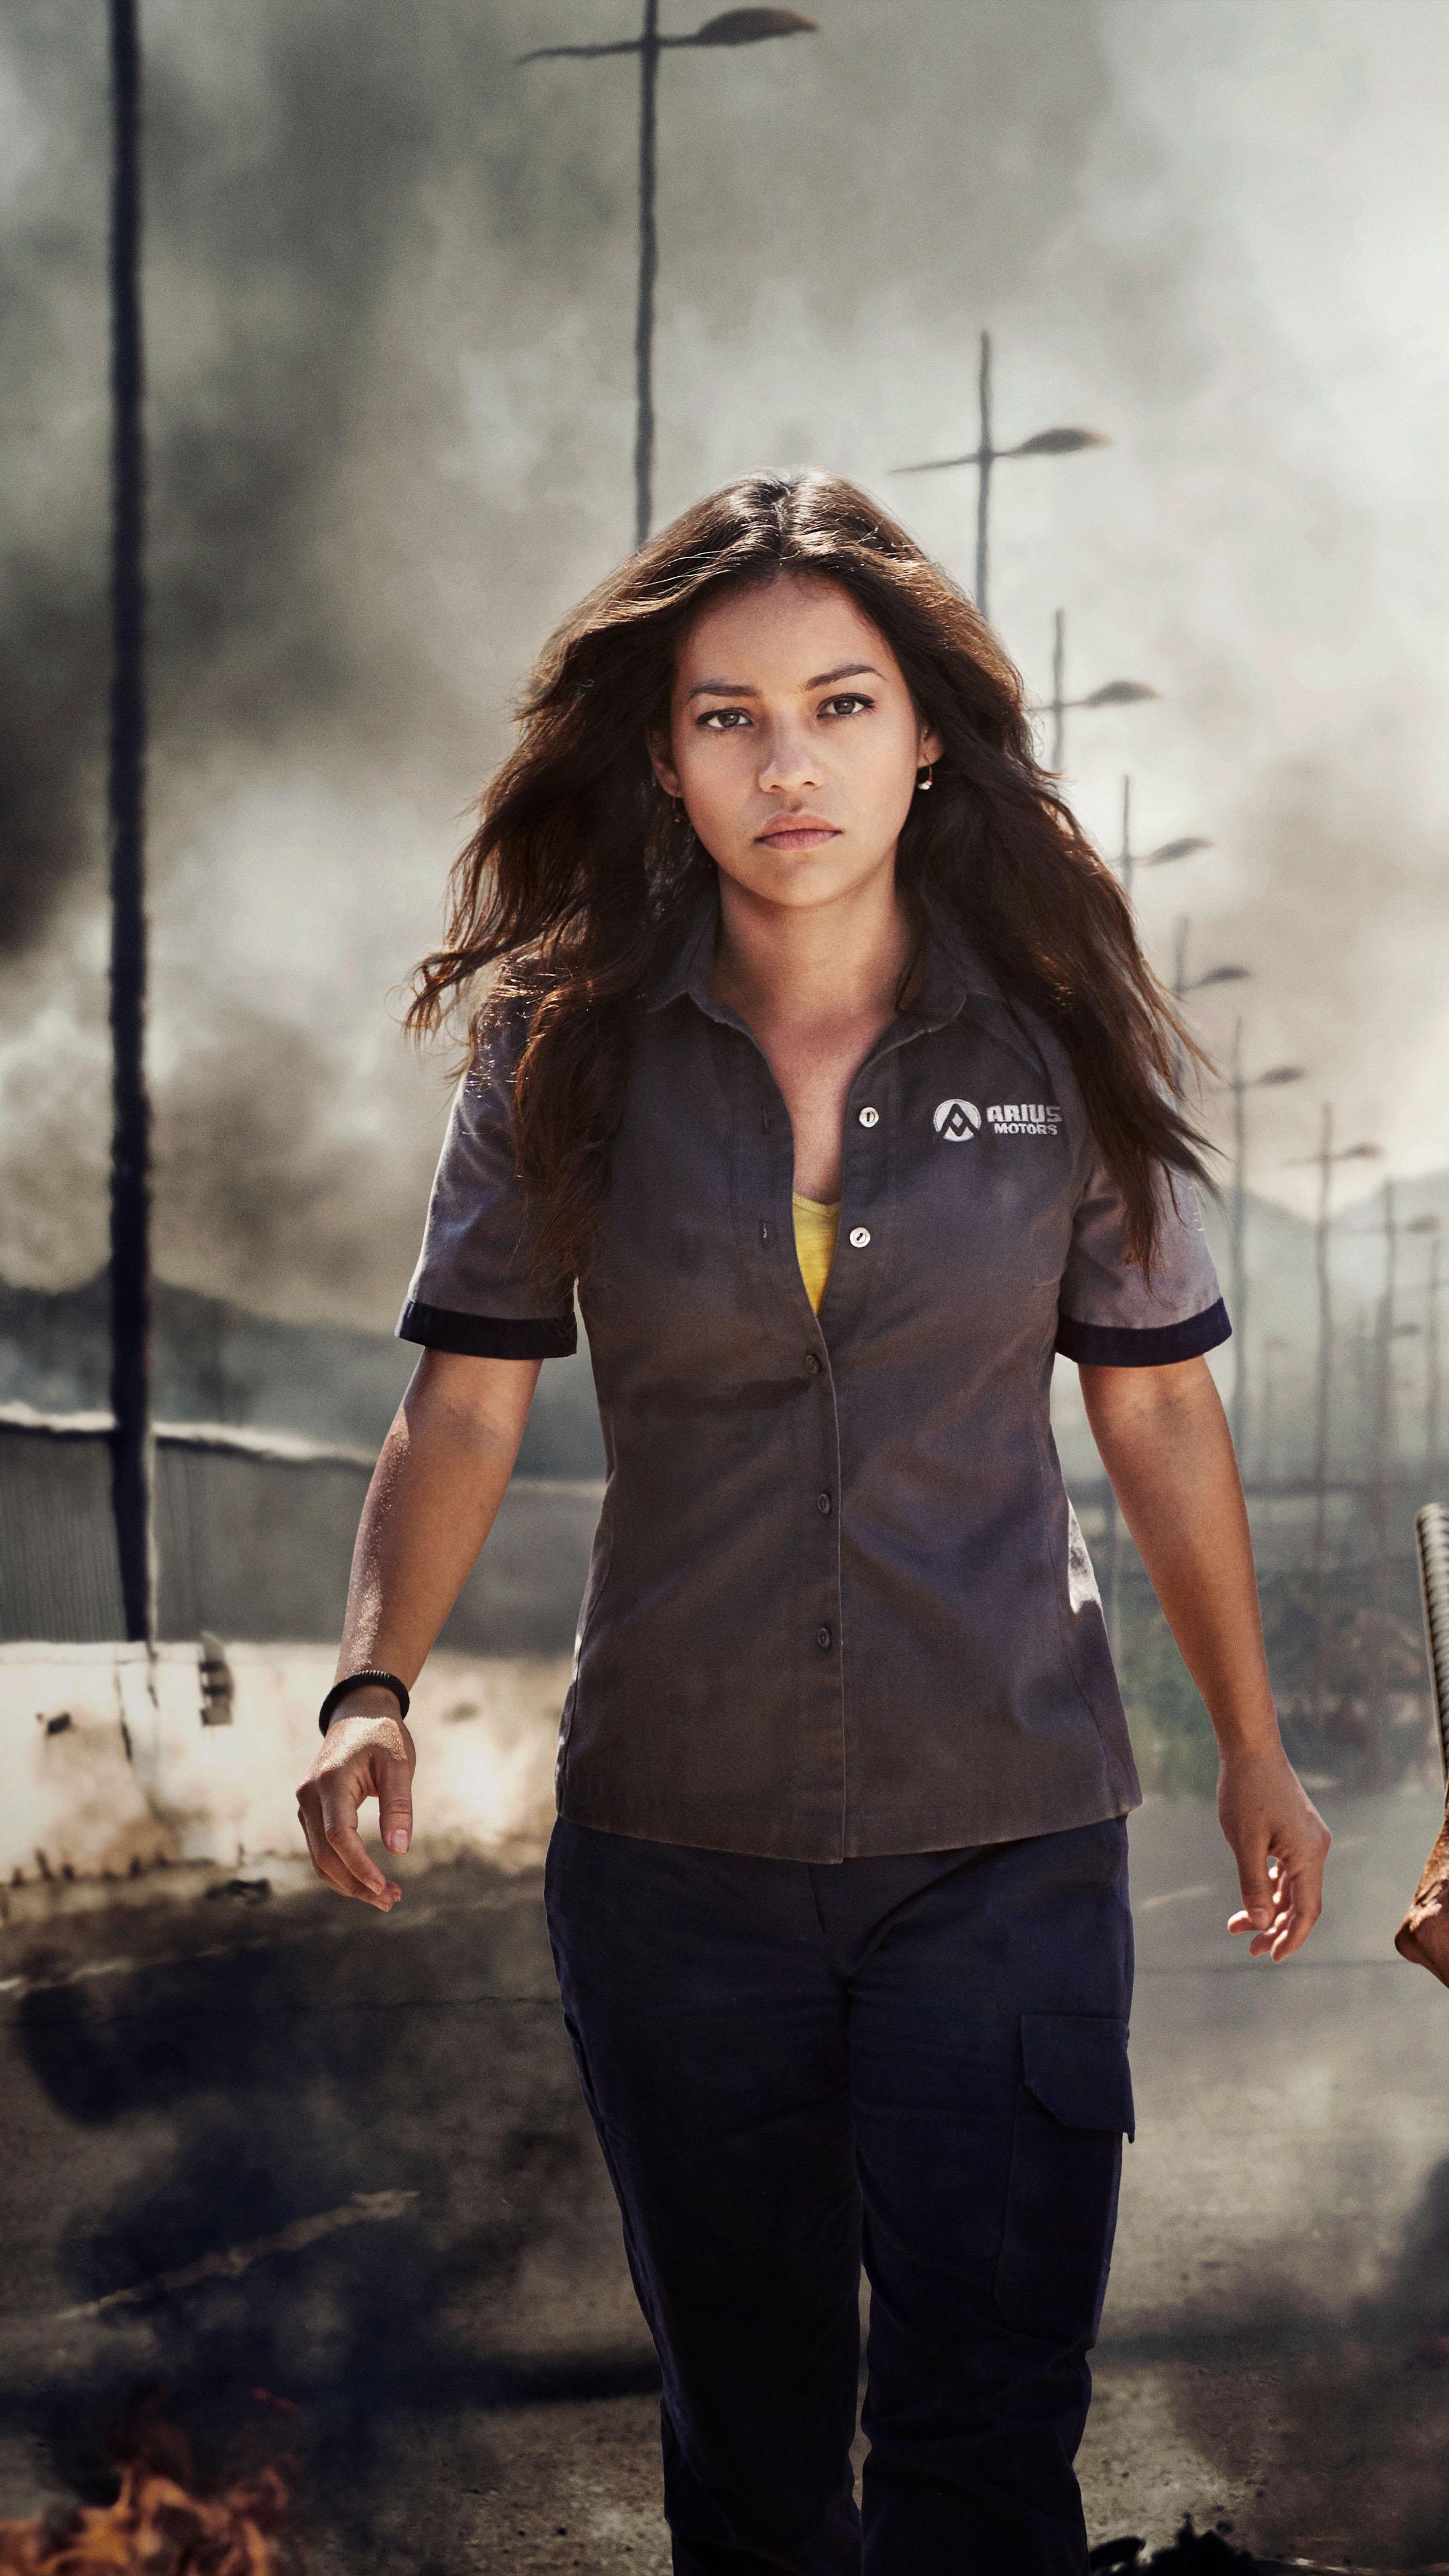 Natalia Reyes In Terminator Dark Fate 2019 Free 4K Ultra HD